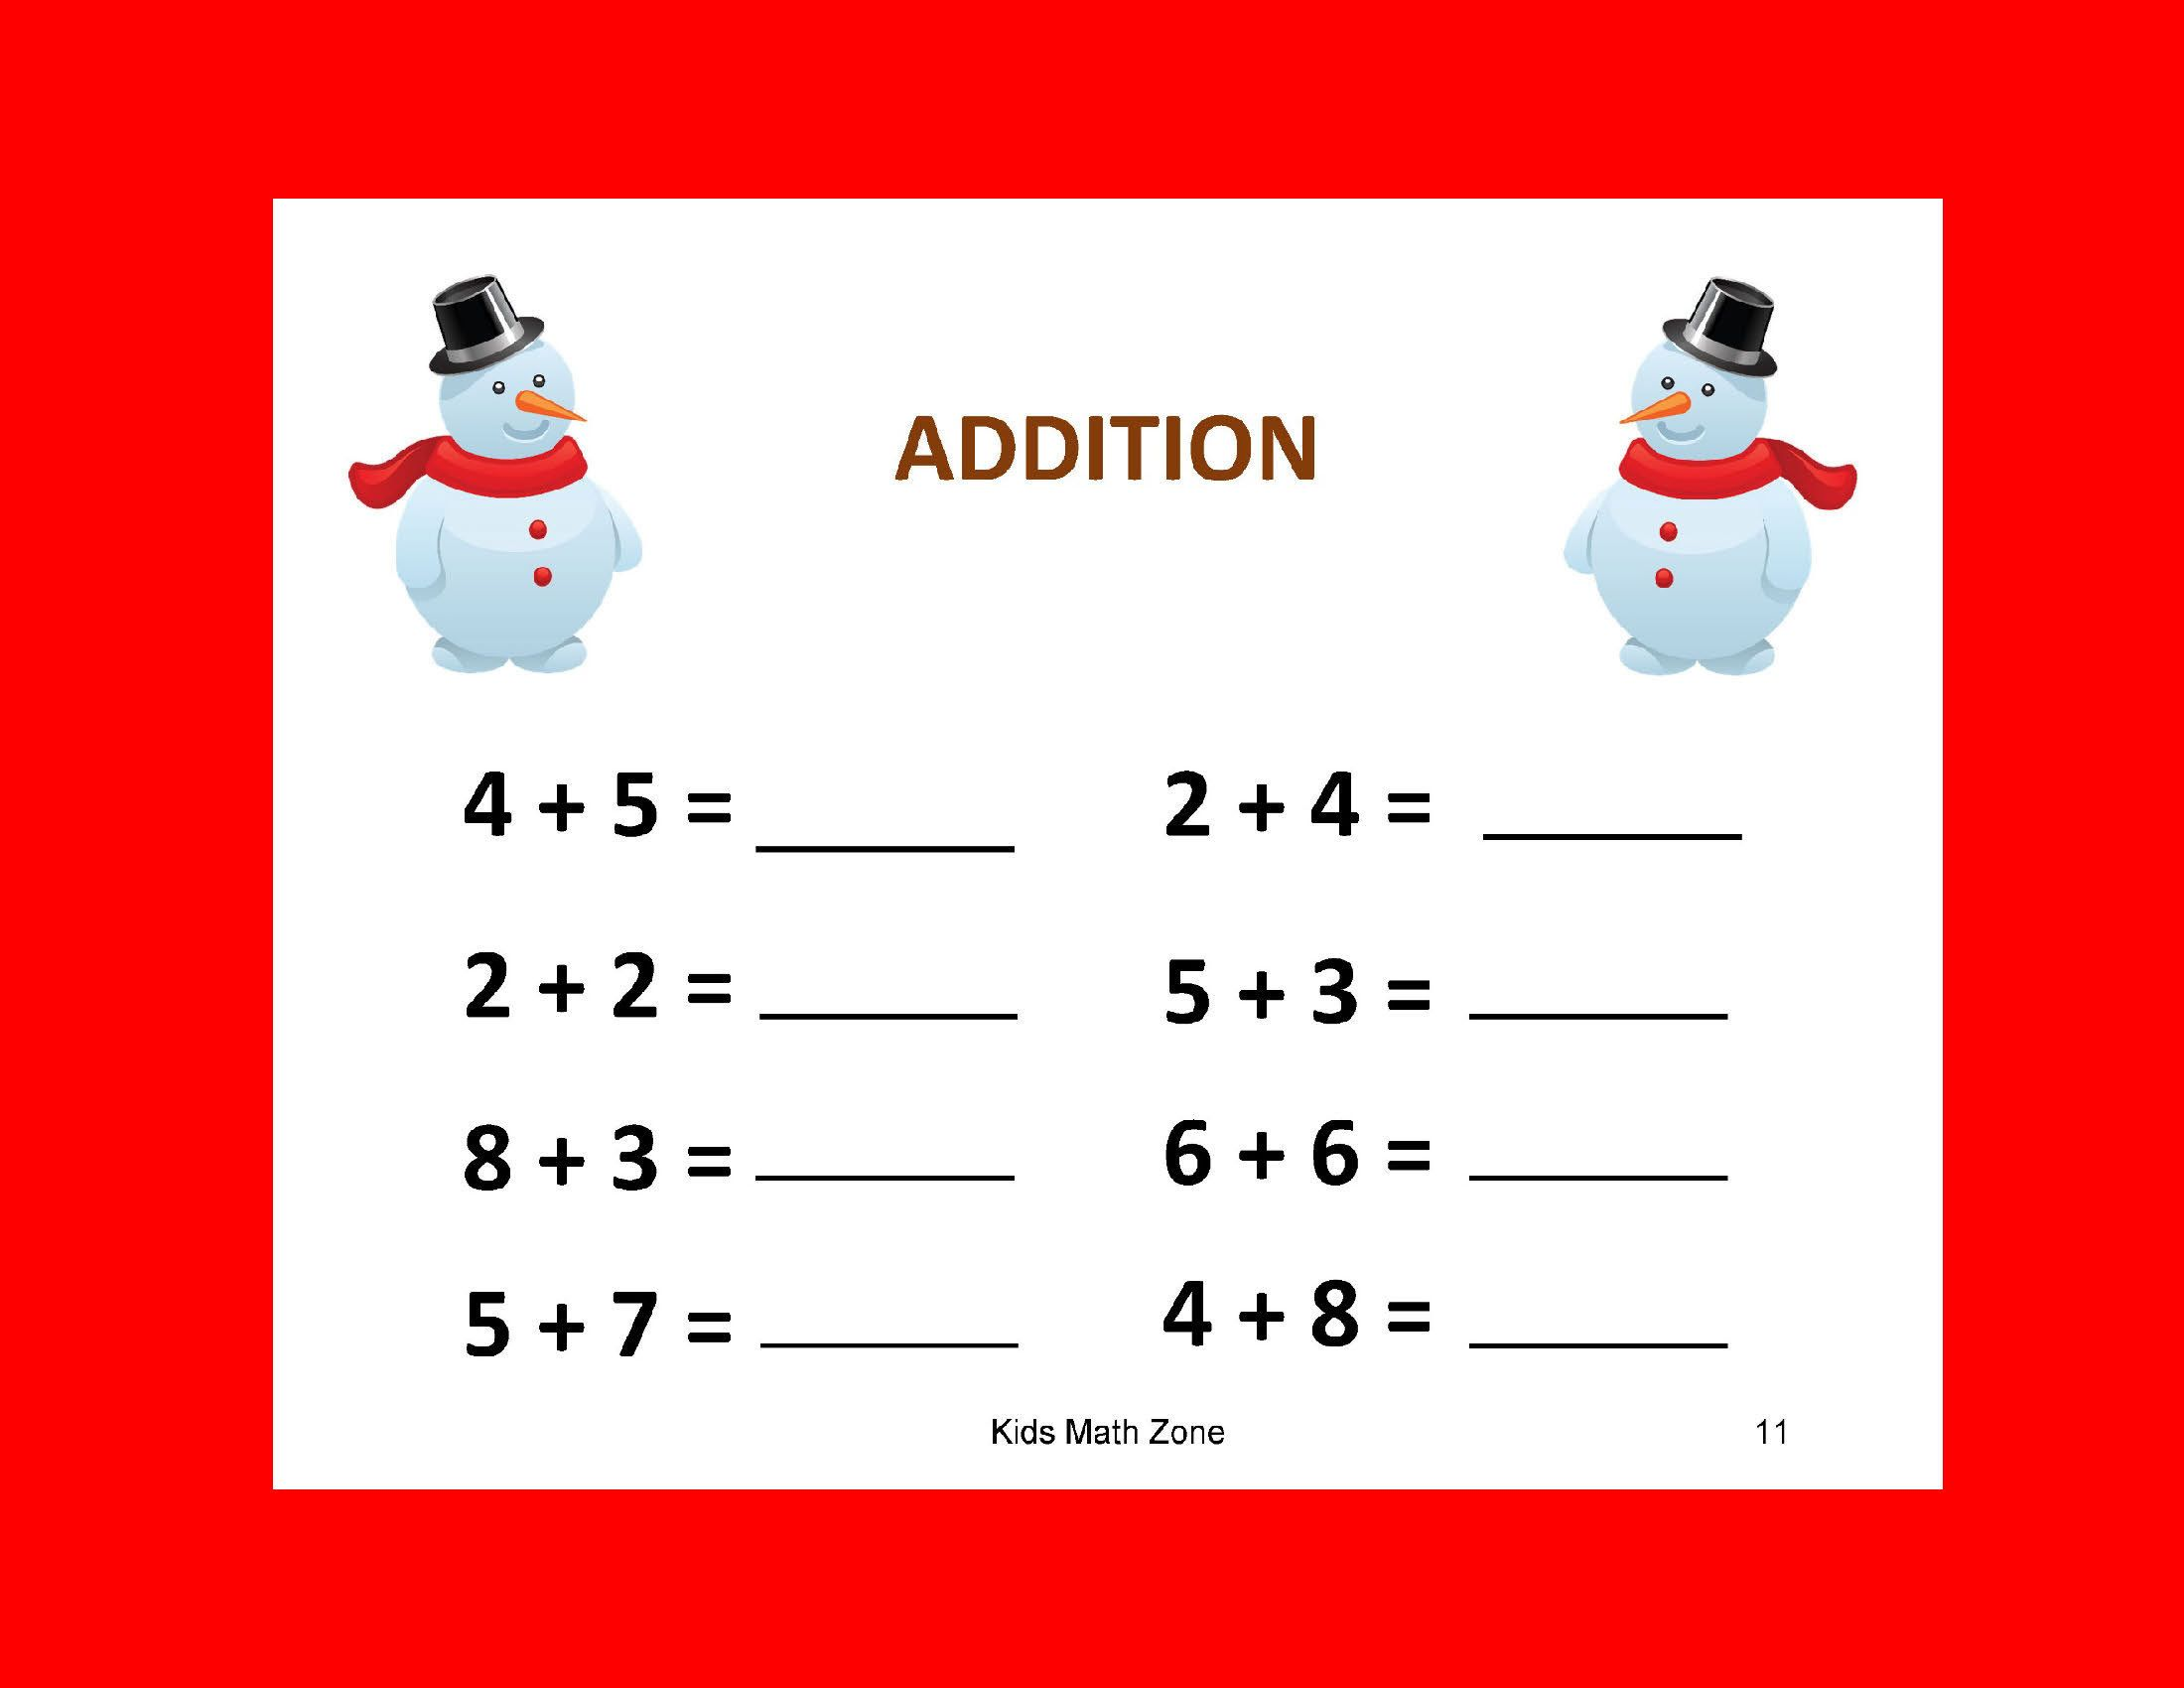 Snowman Addition B 12 Worksheets Preschool